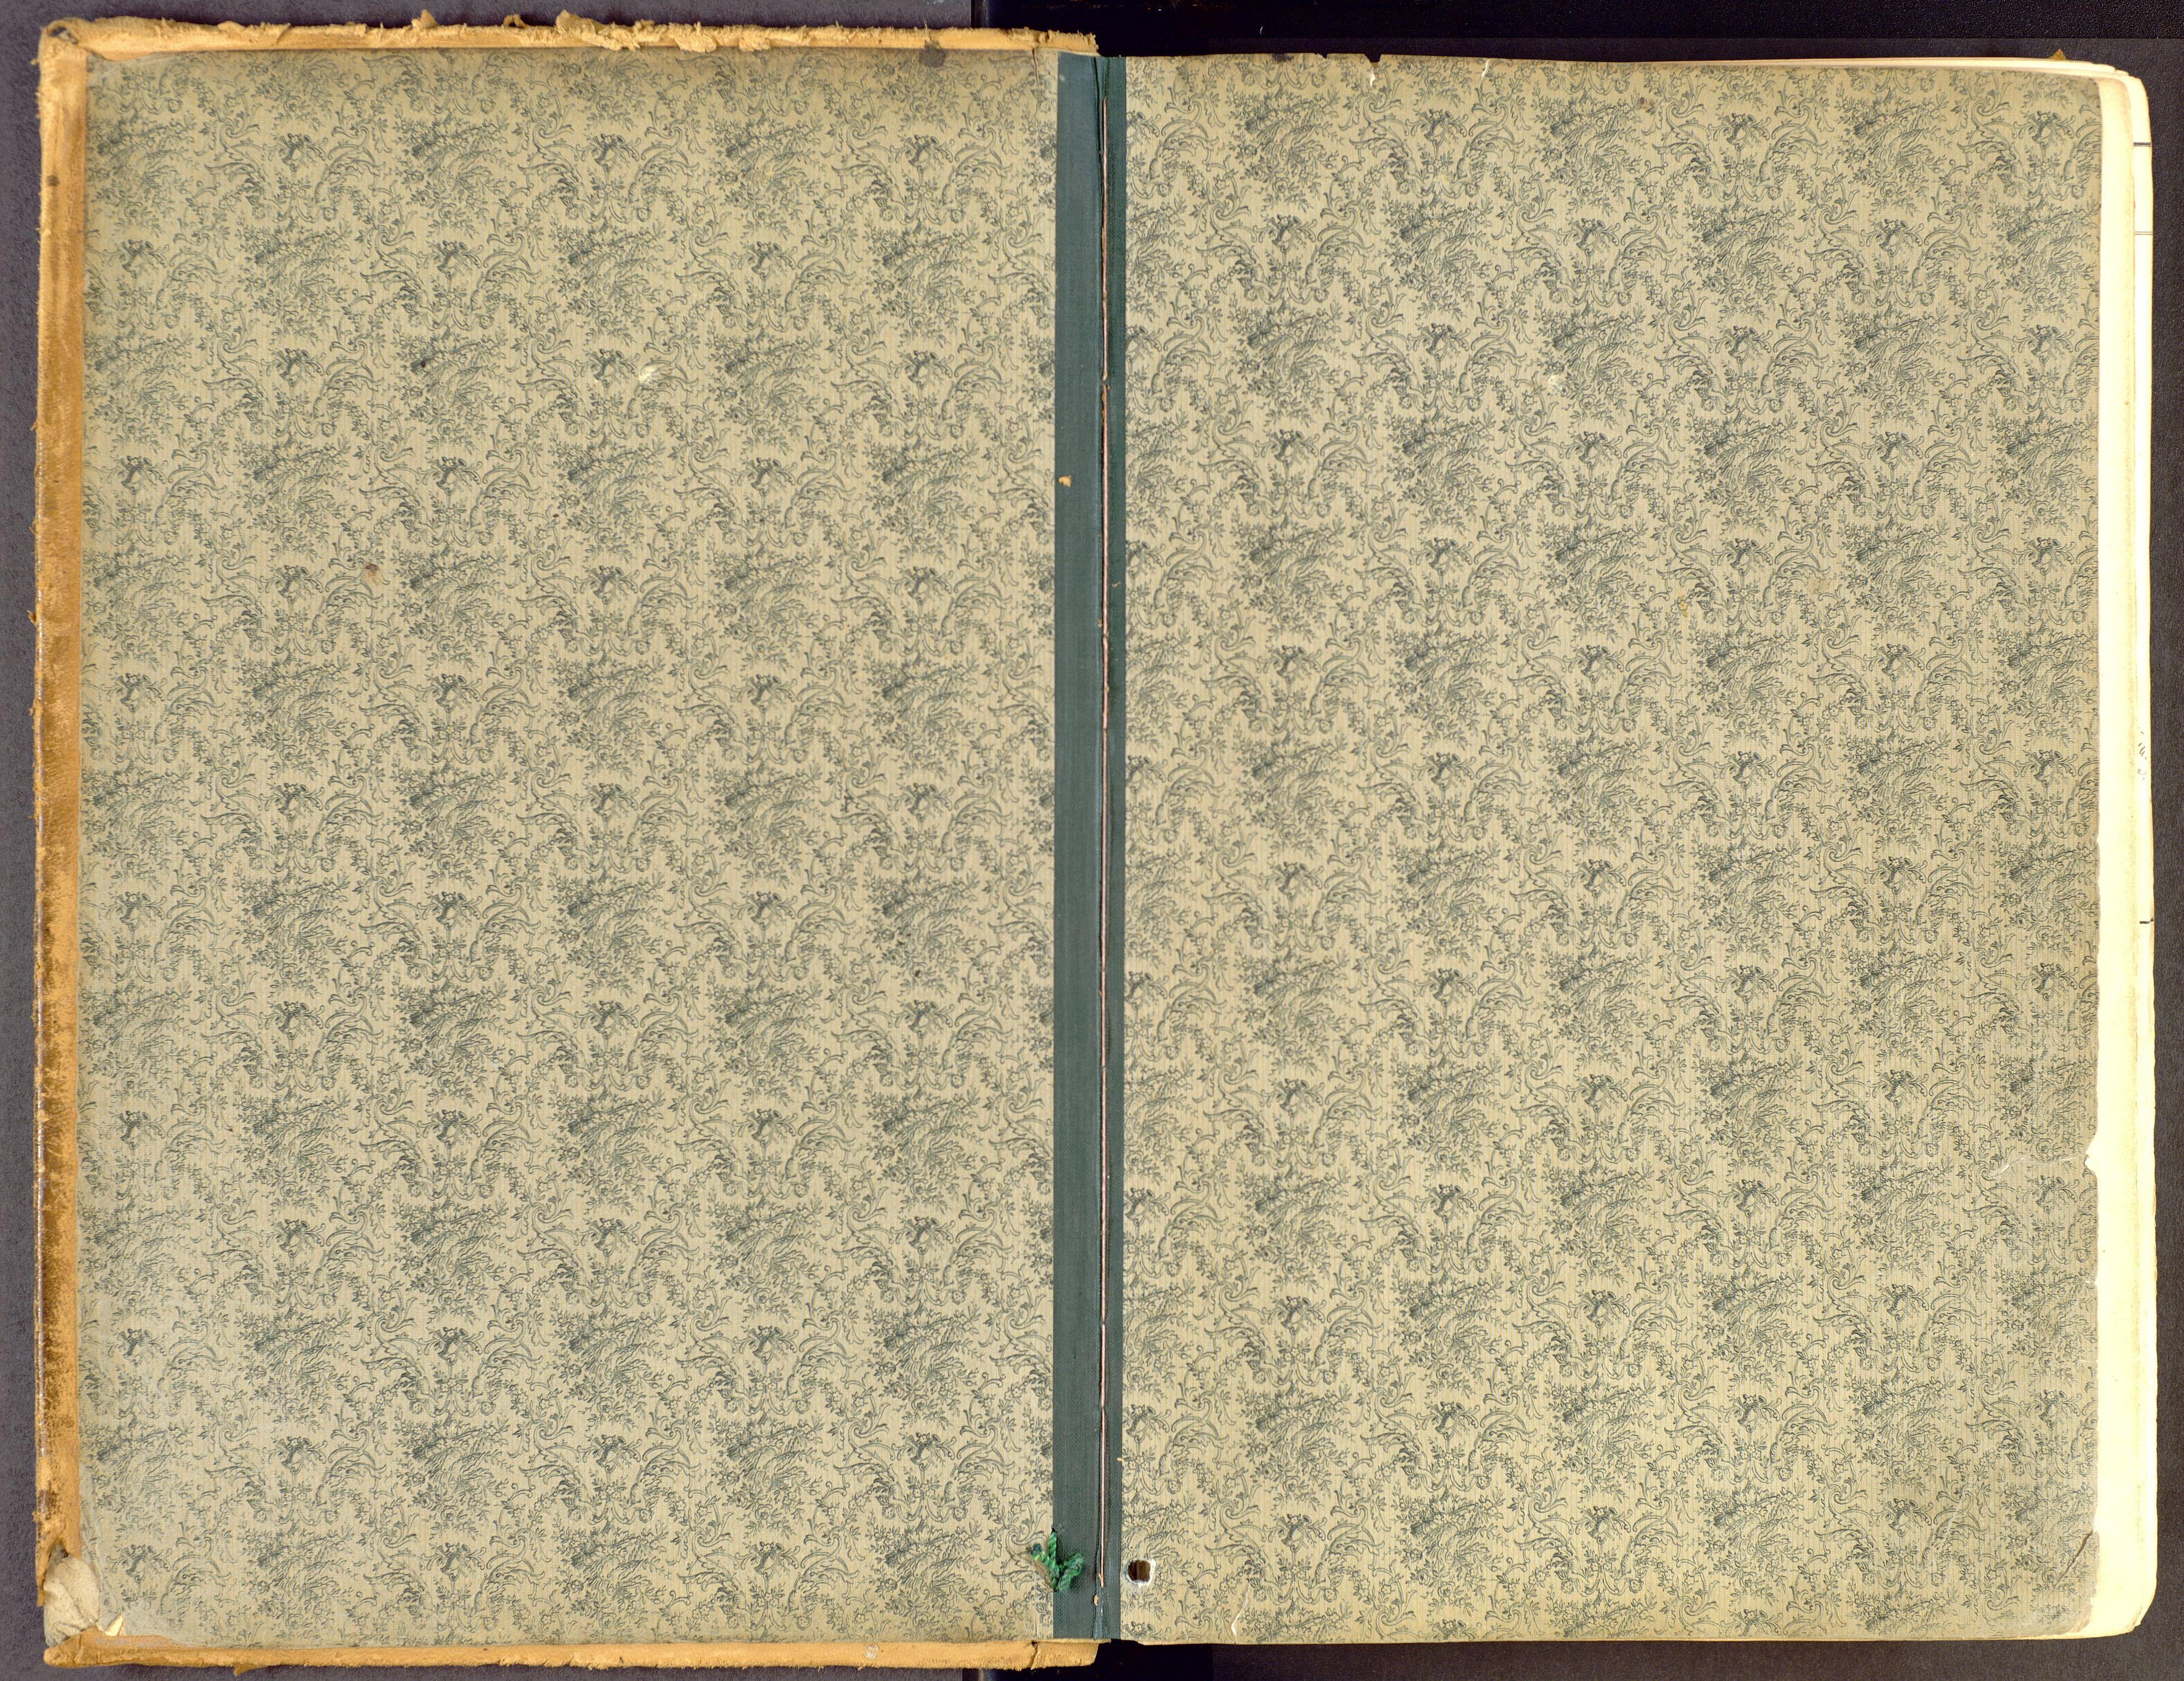 SAH, Vestre Gausdal prestekontor, Ministerialbok nr. 1, 1887-1914